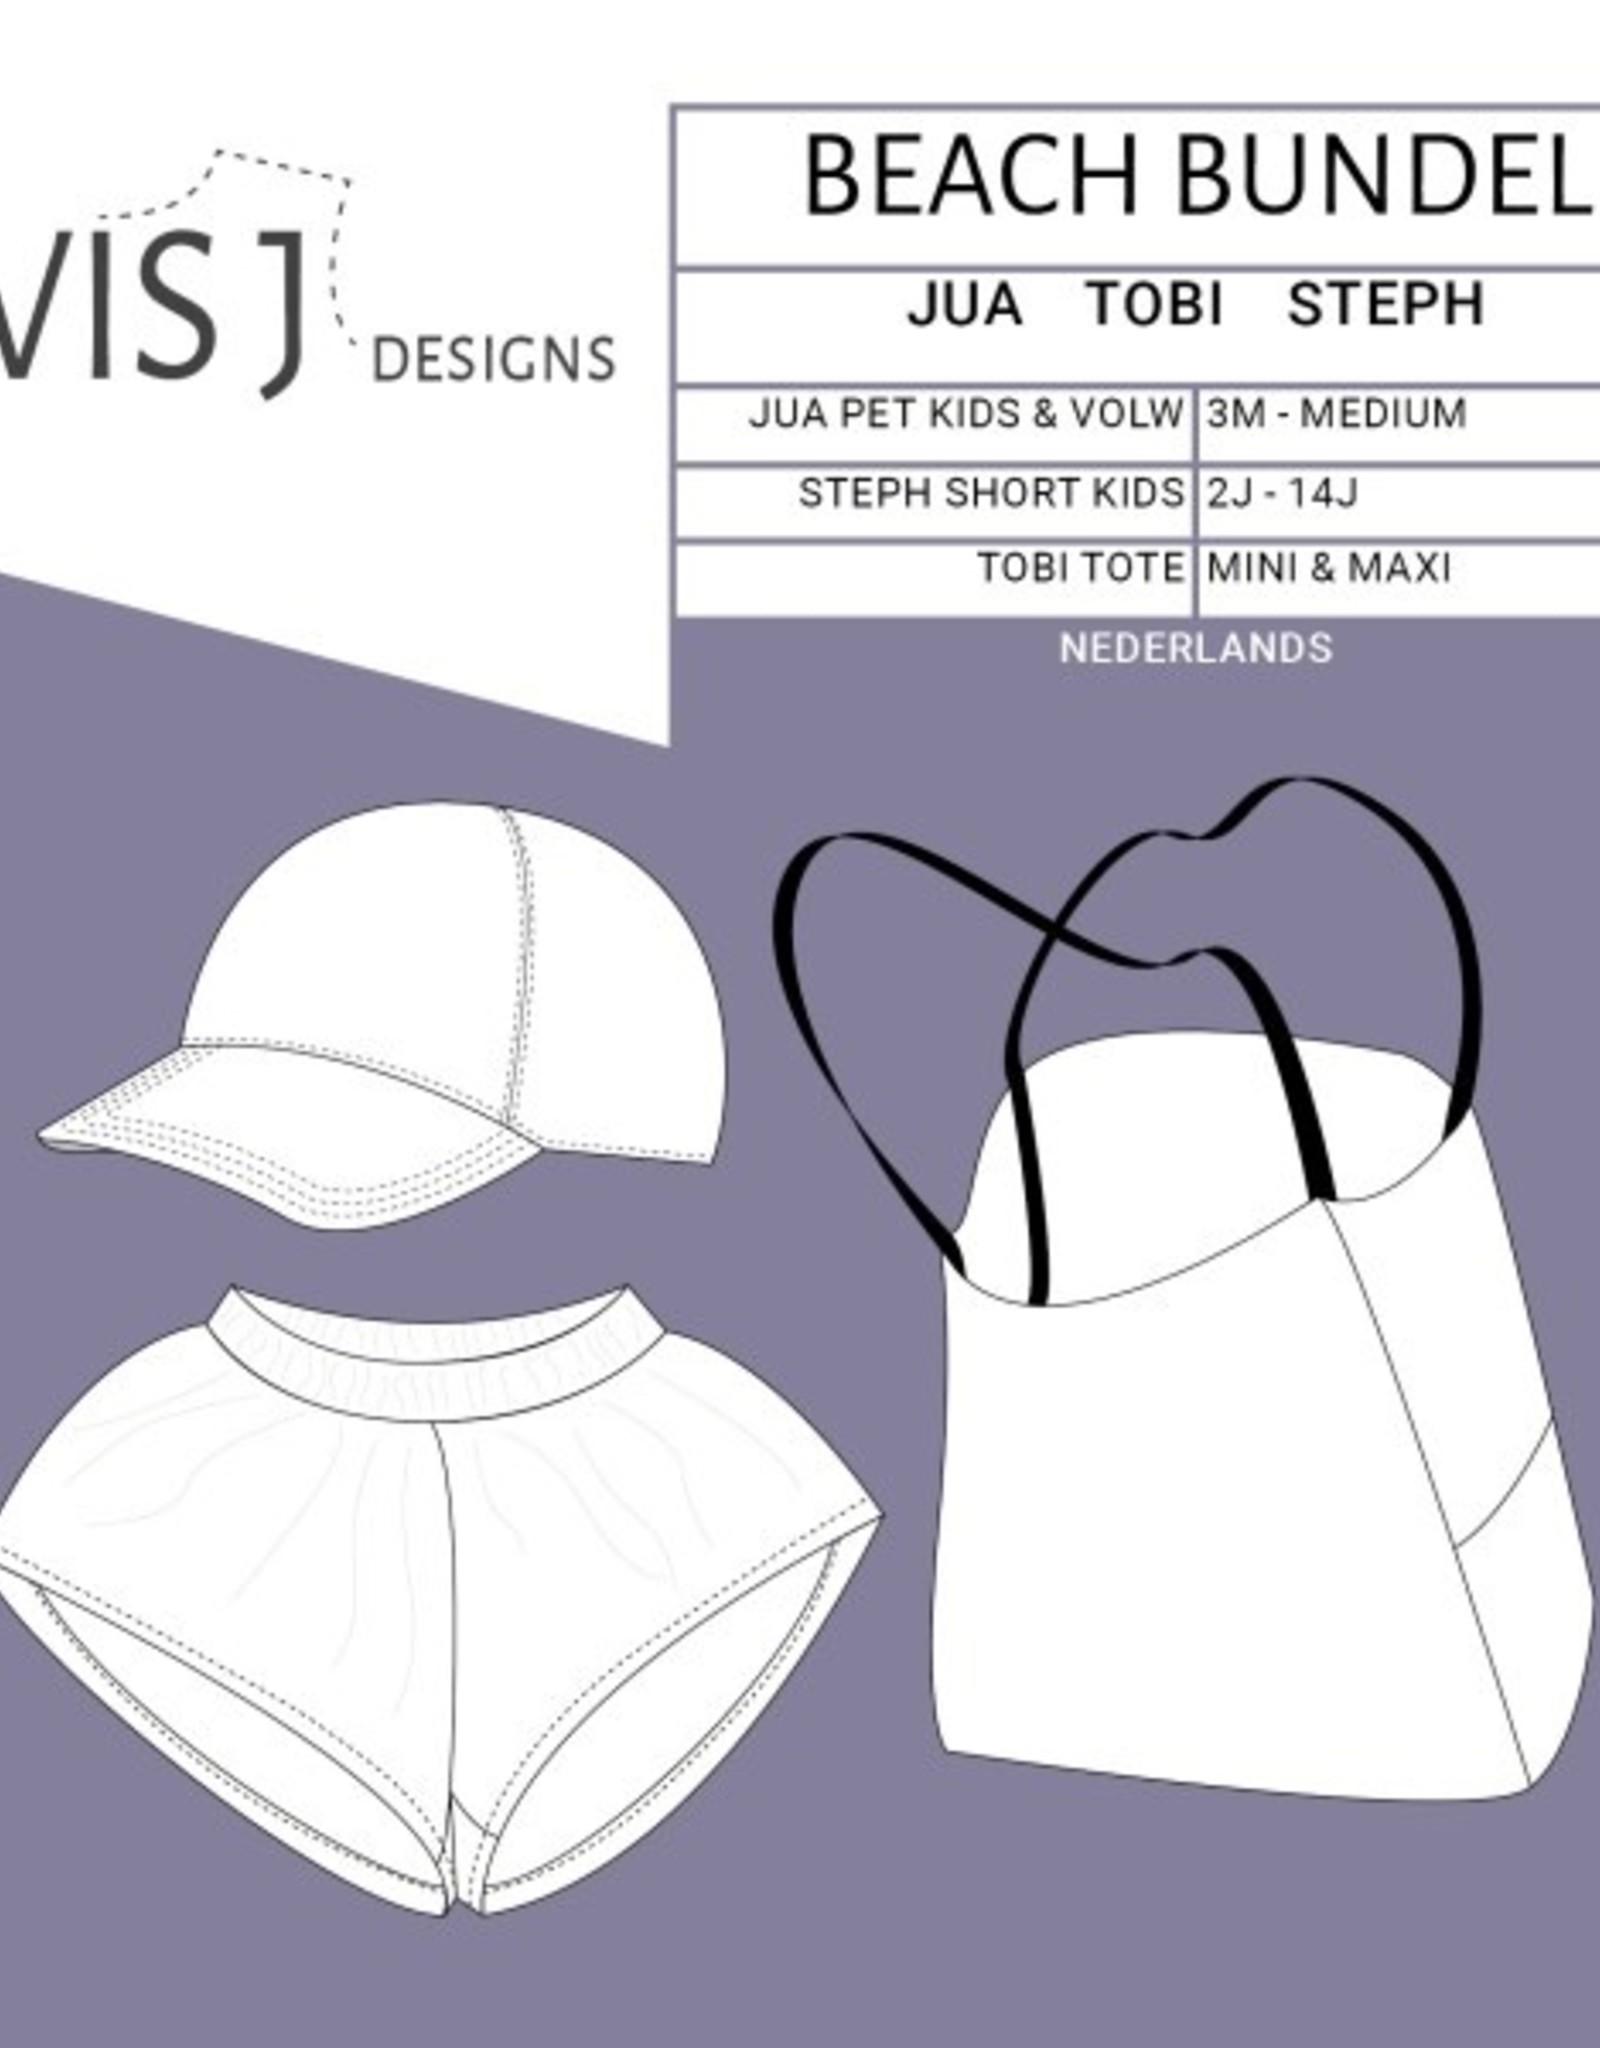 WISJ Designs Beach bundle